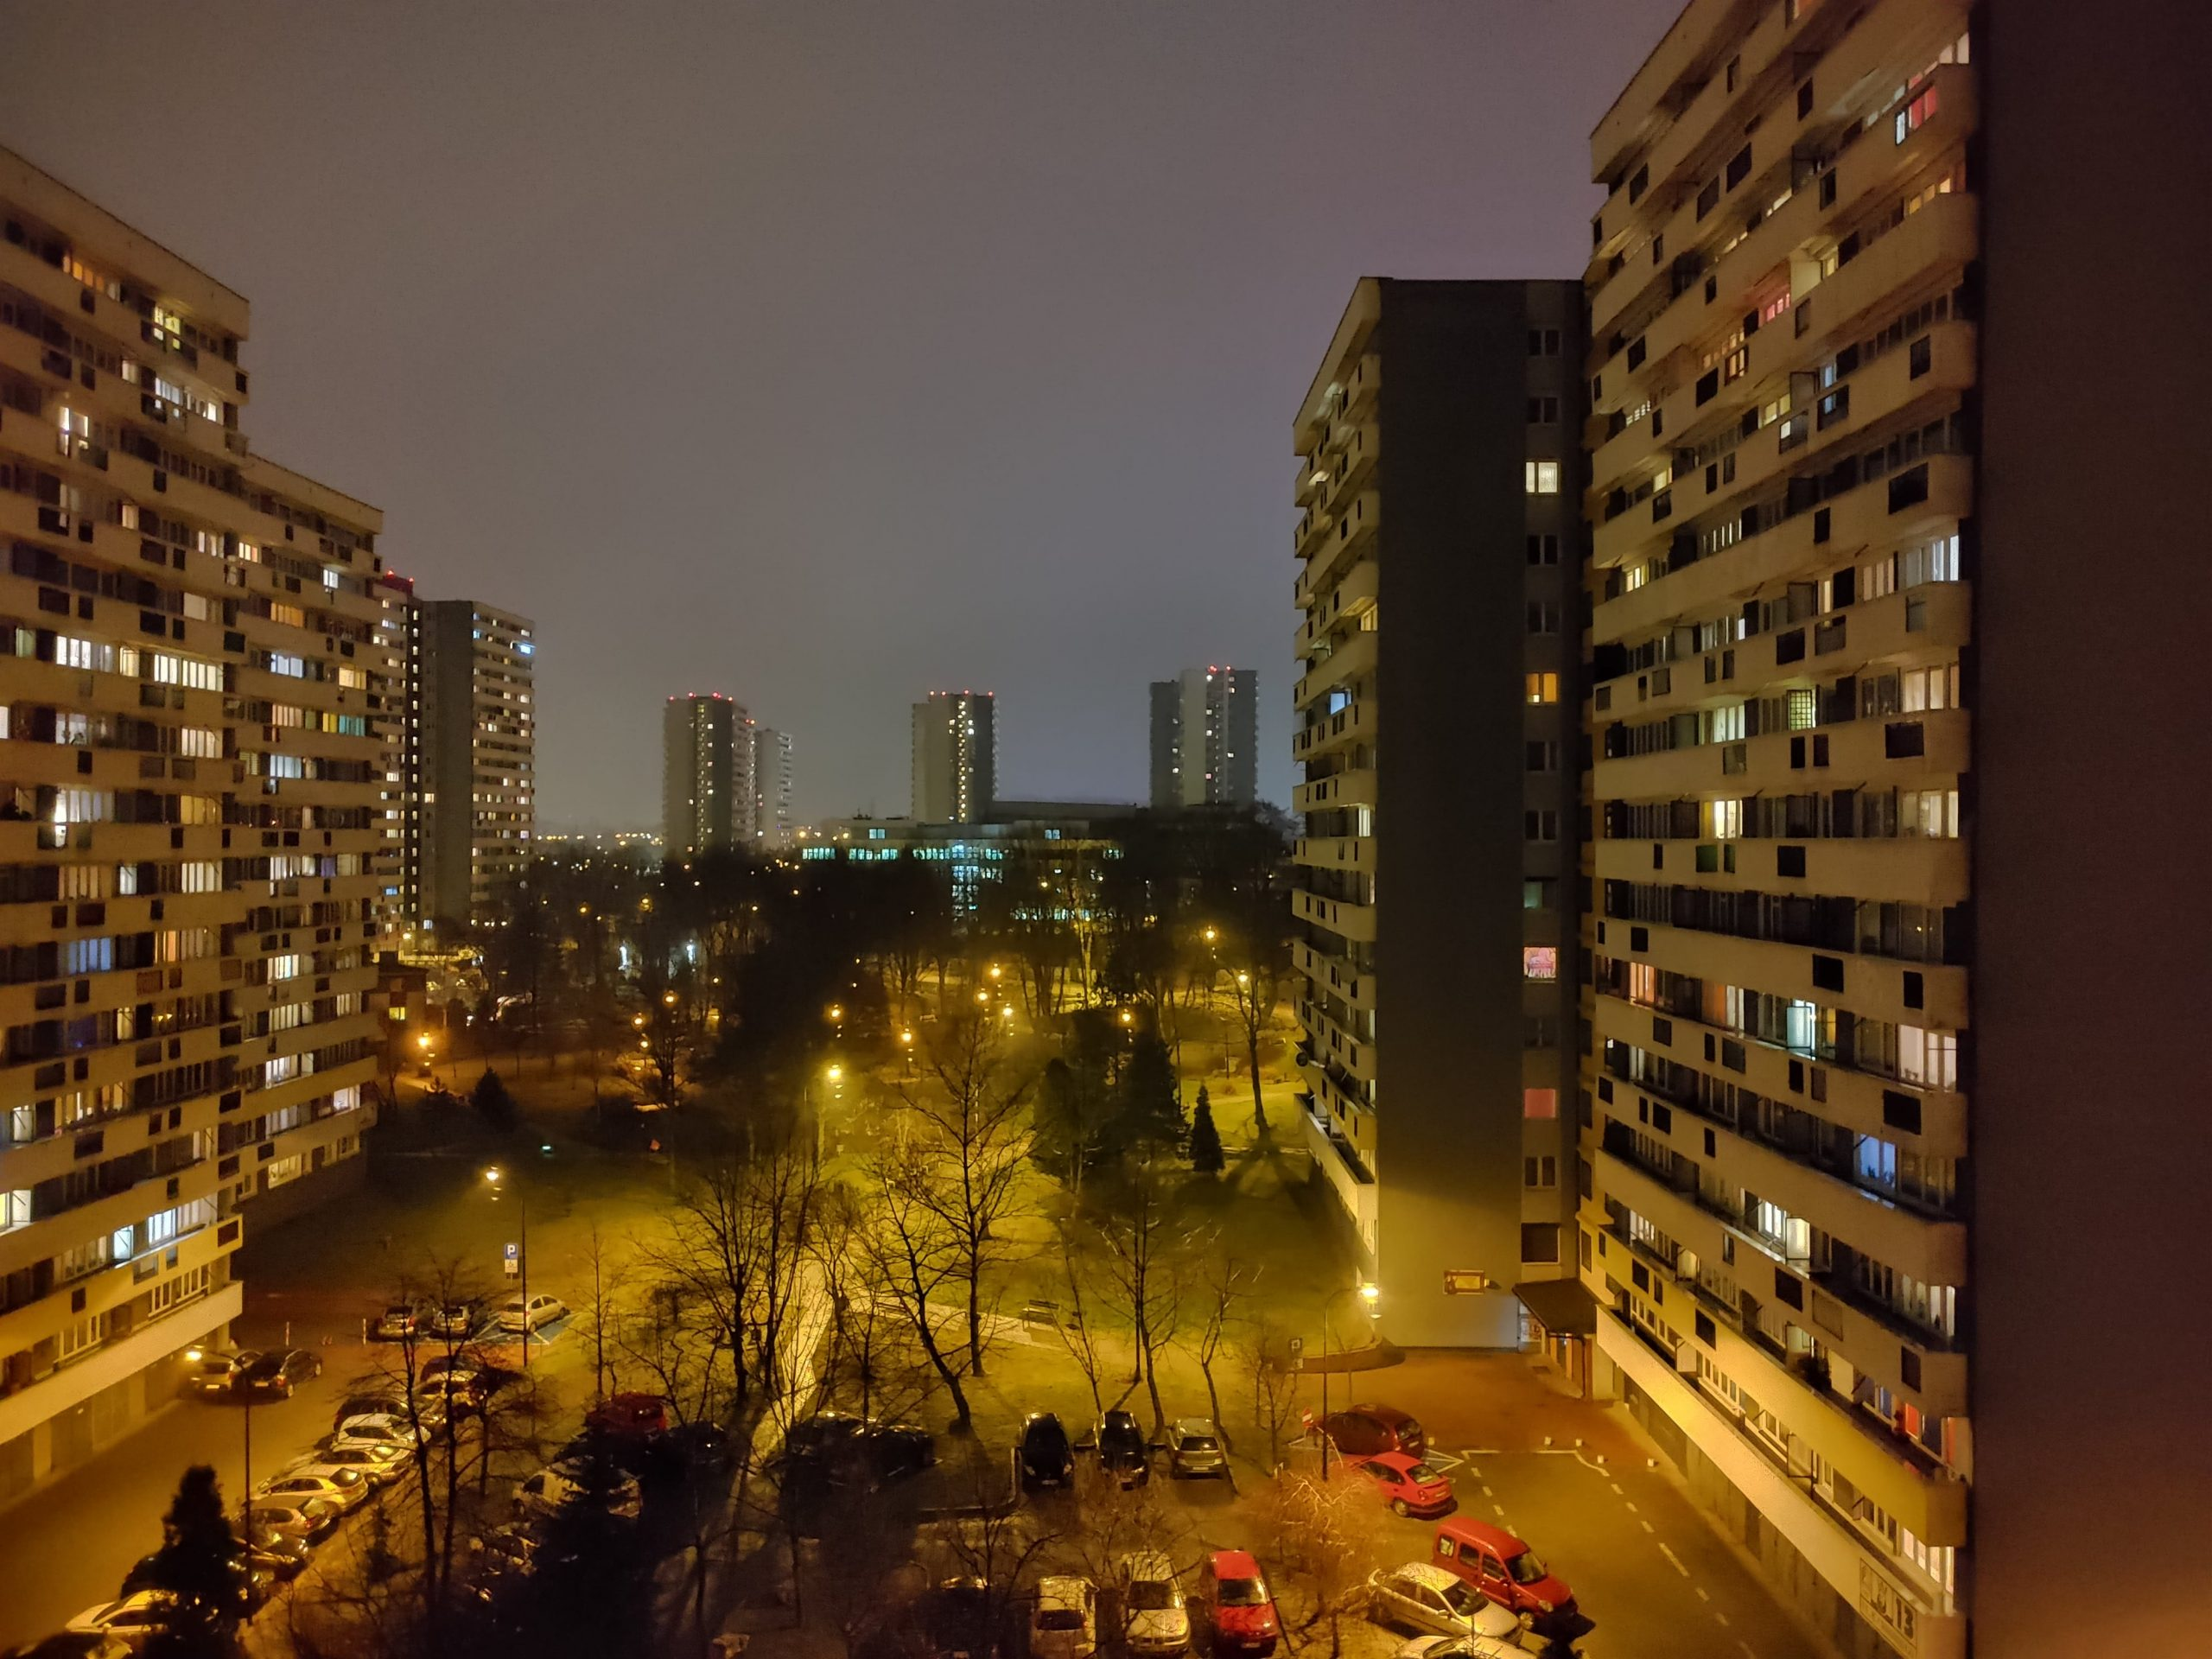 Zdjęcia nocne - LG G8X ThinQ